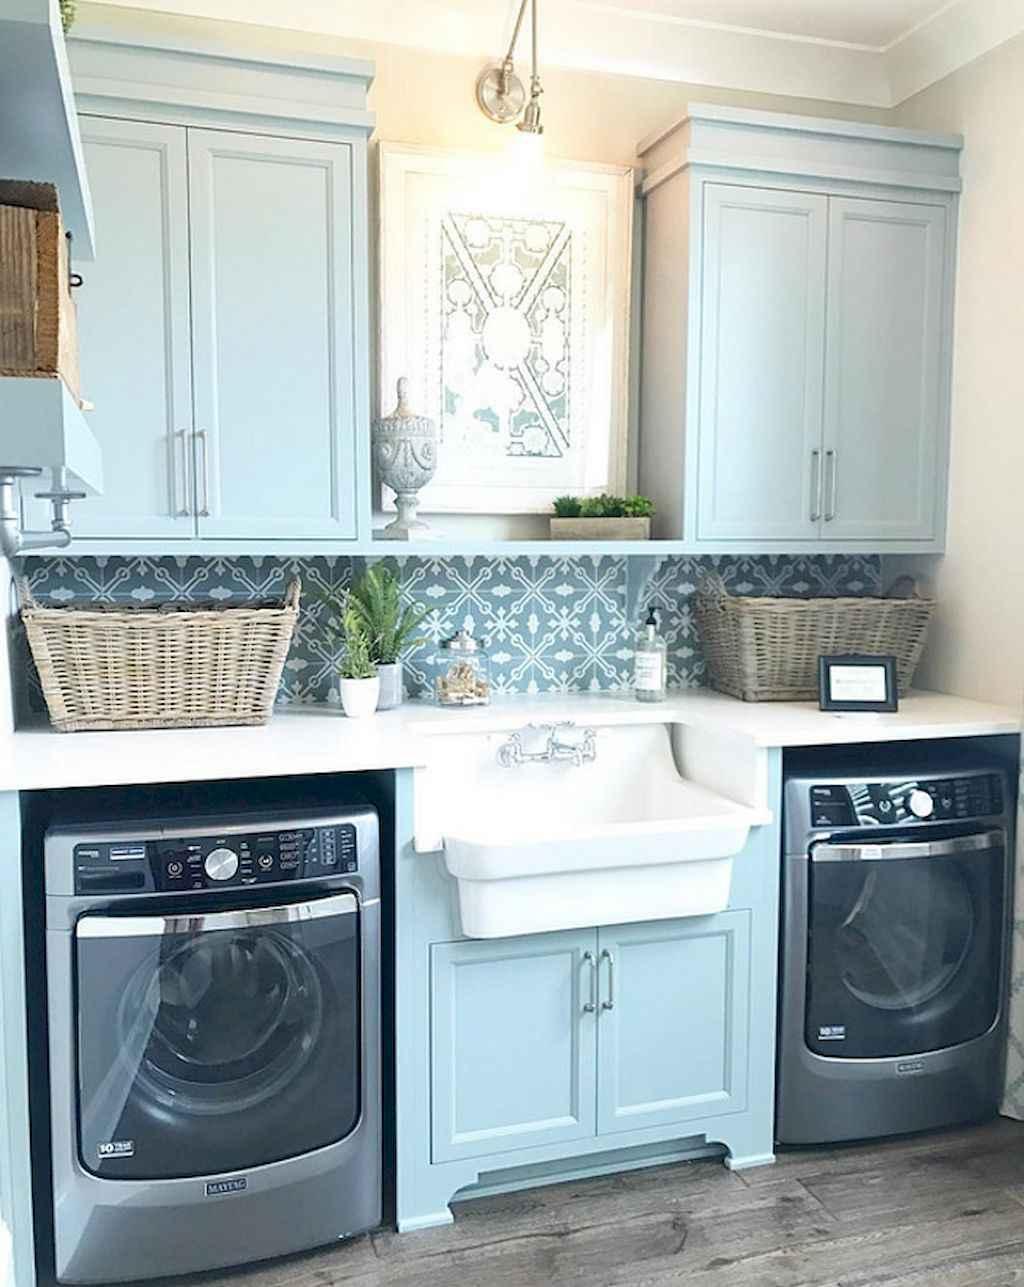 60 fancy farmhouse kitchen backsplash decor ideas (47) - Roomadness.com